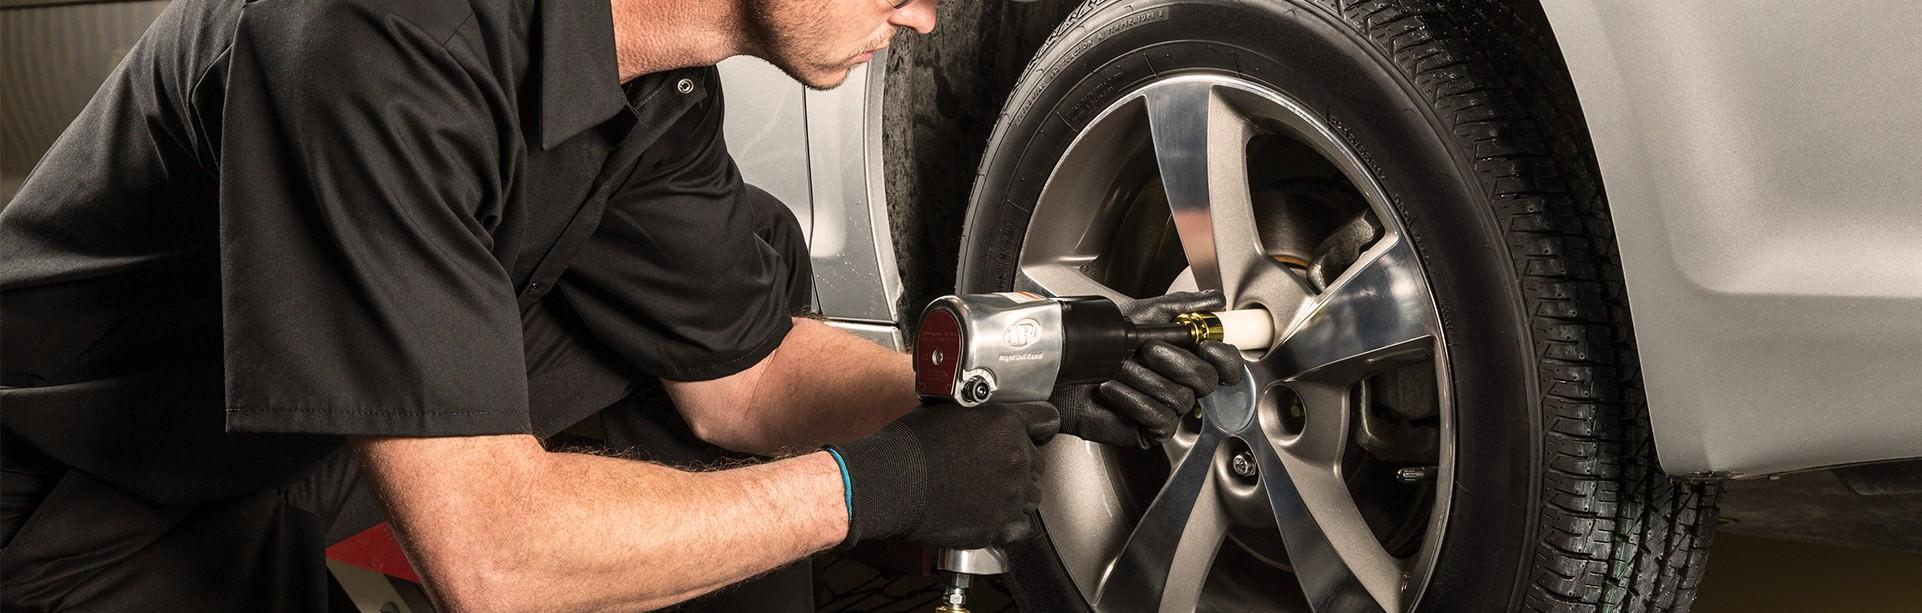 san jose tire services